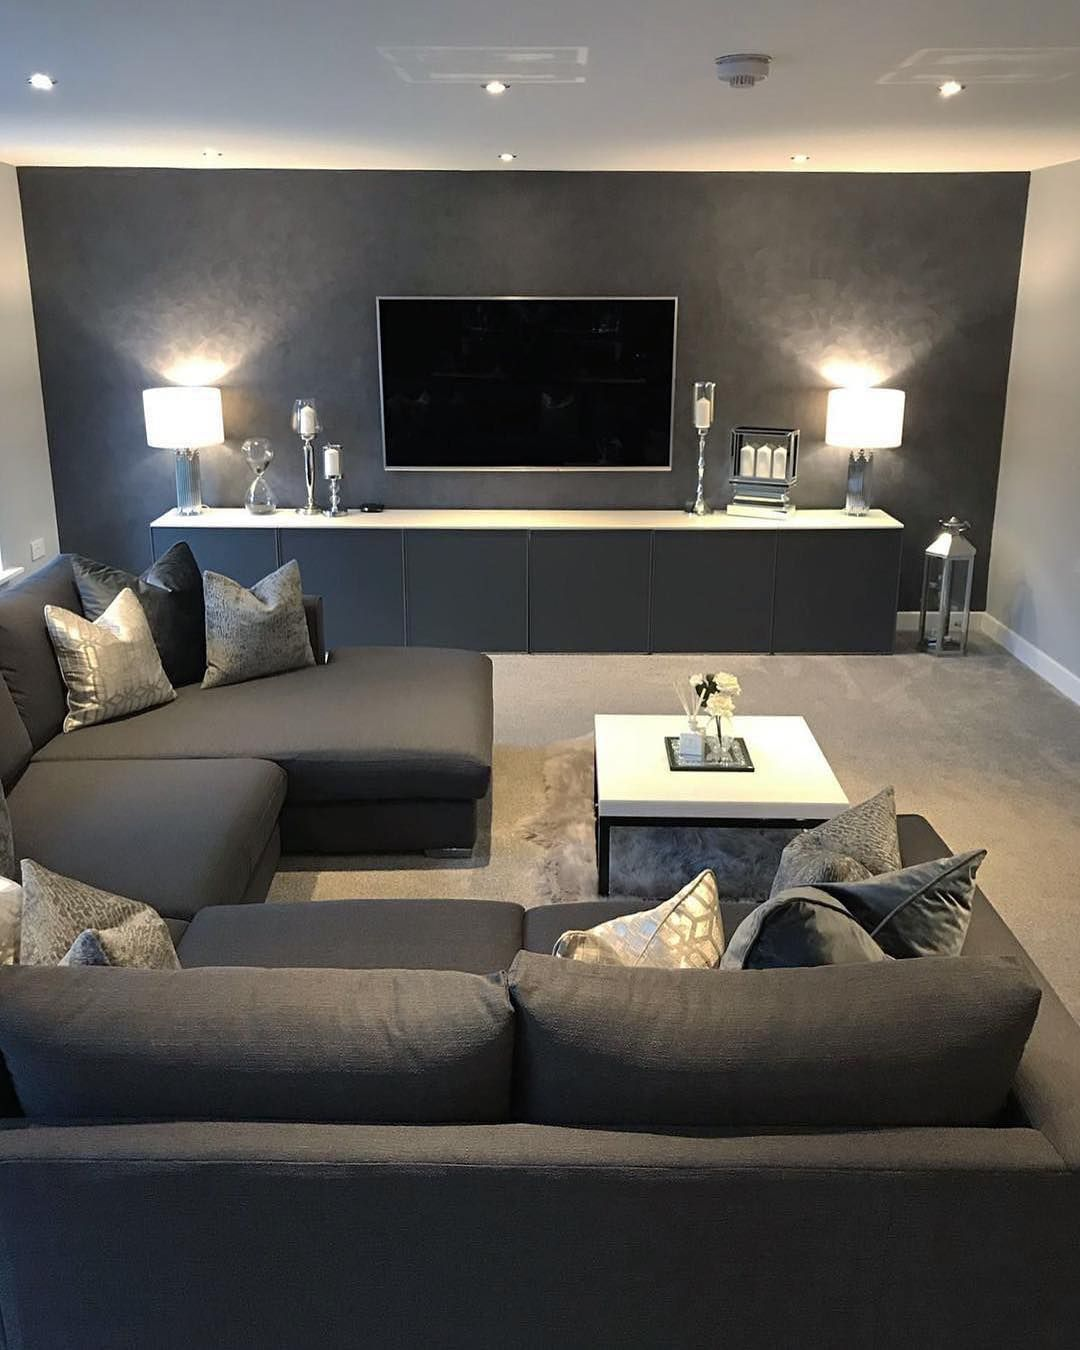 New The 10 Best Interior Designs In The World Interior Design